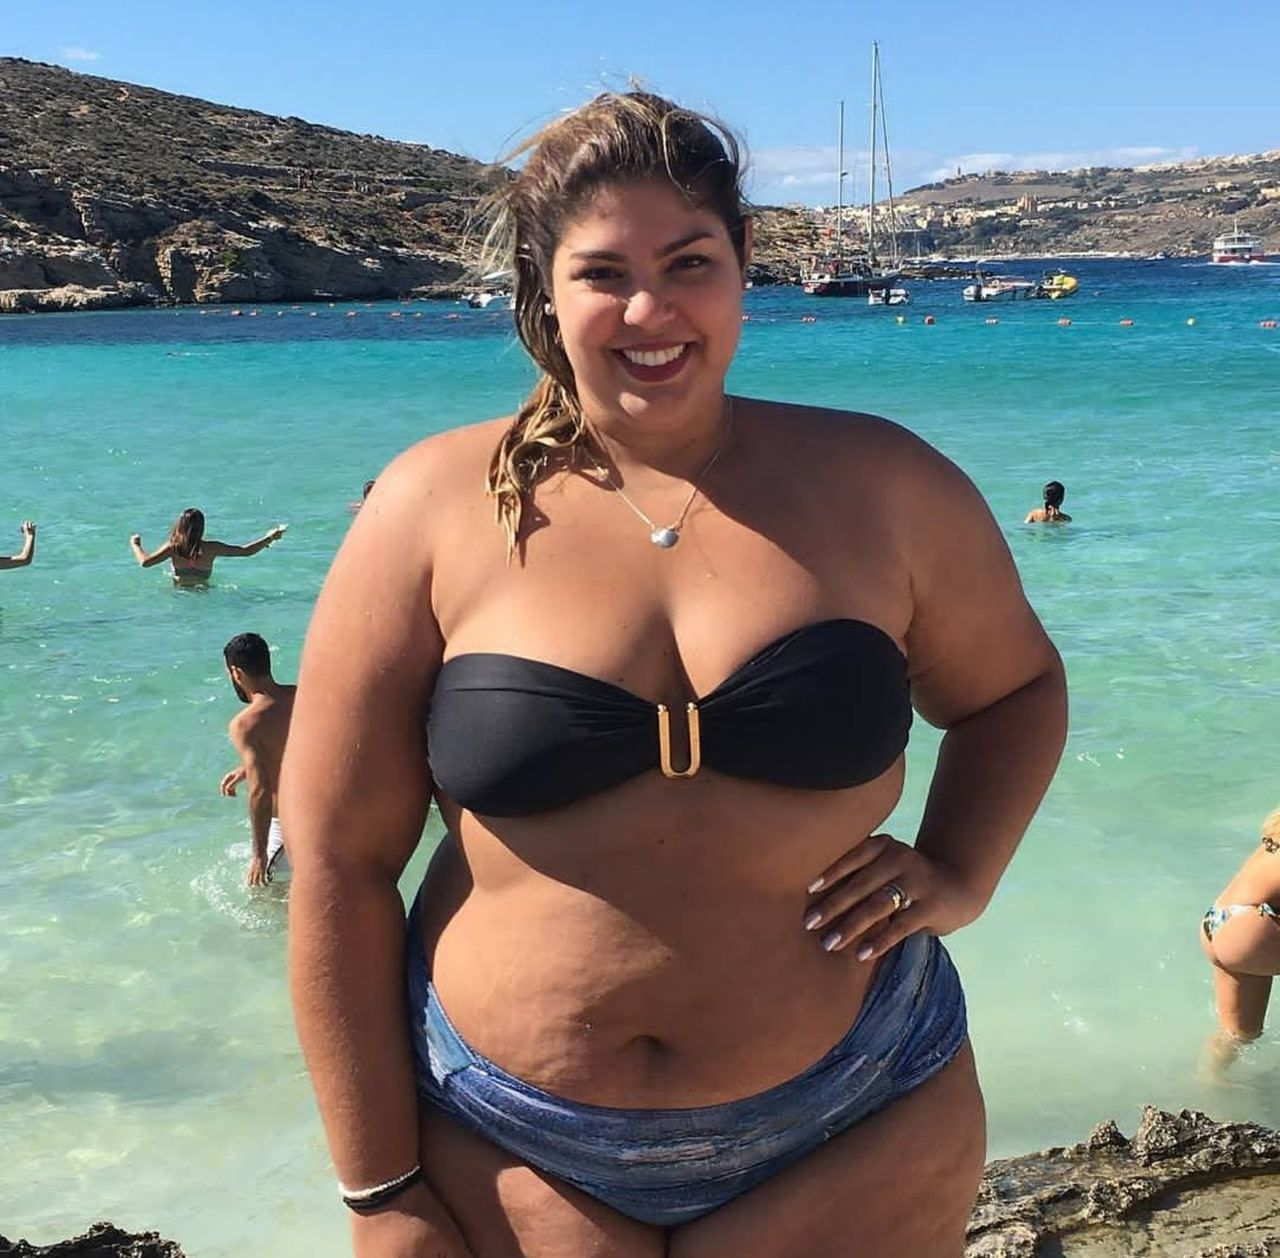 Bikini Laurine Matt nude photos 2019